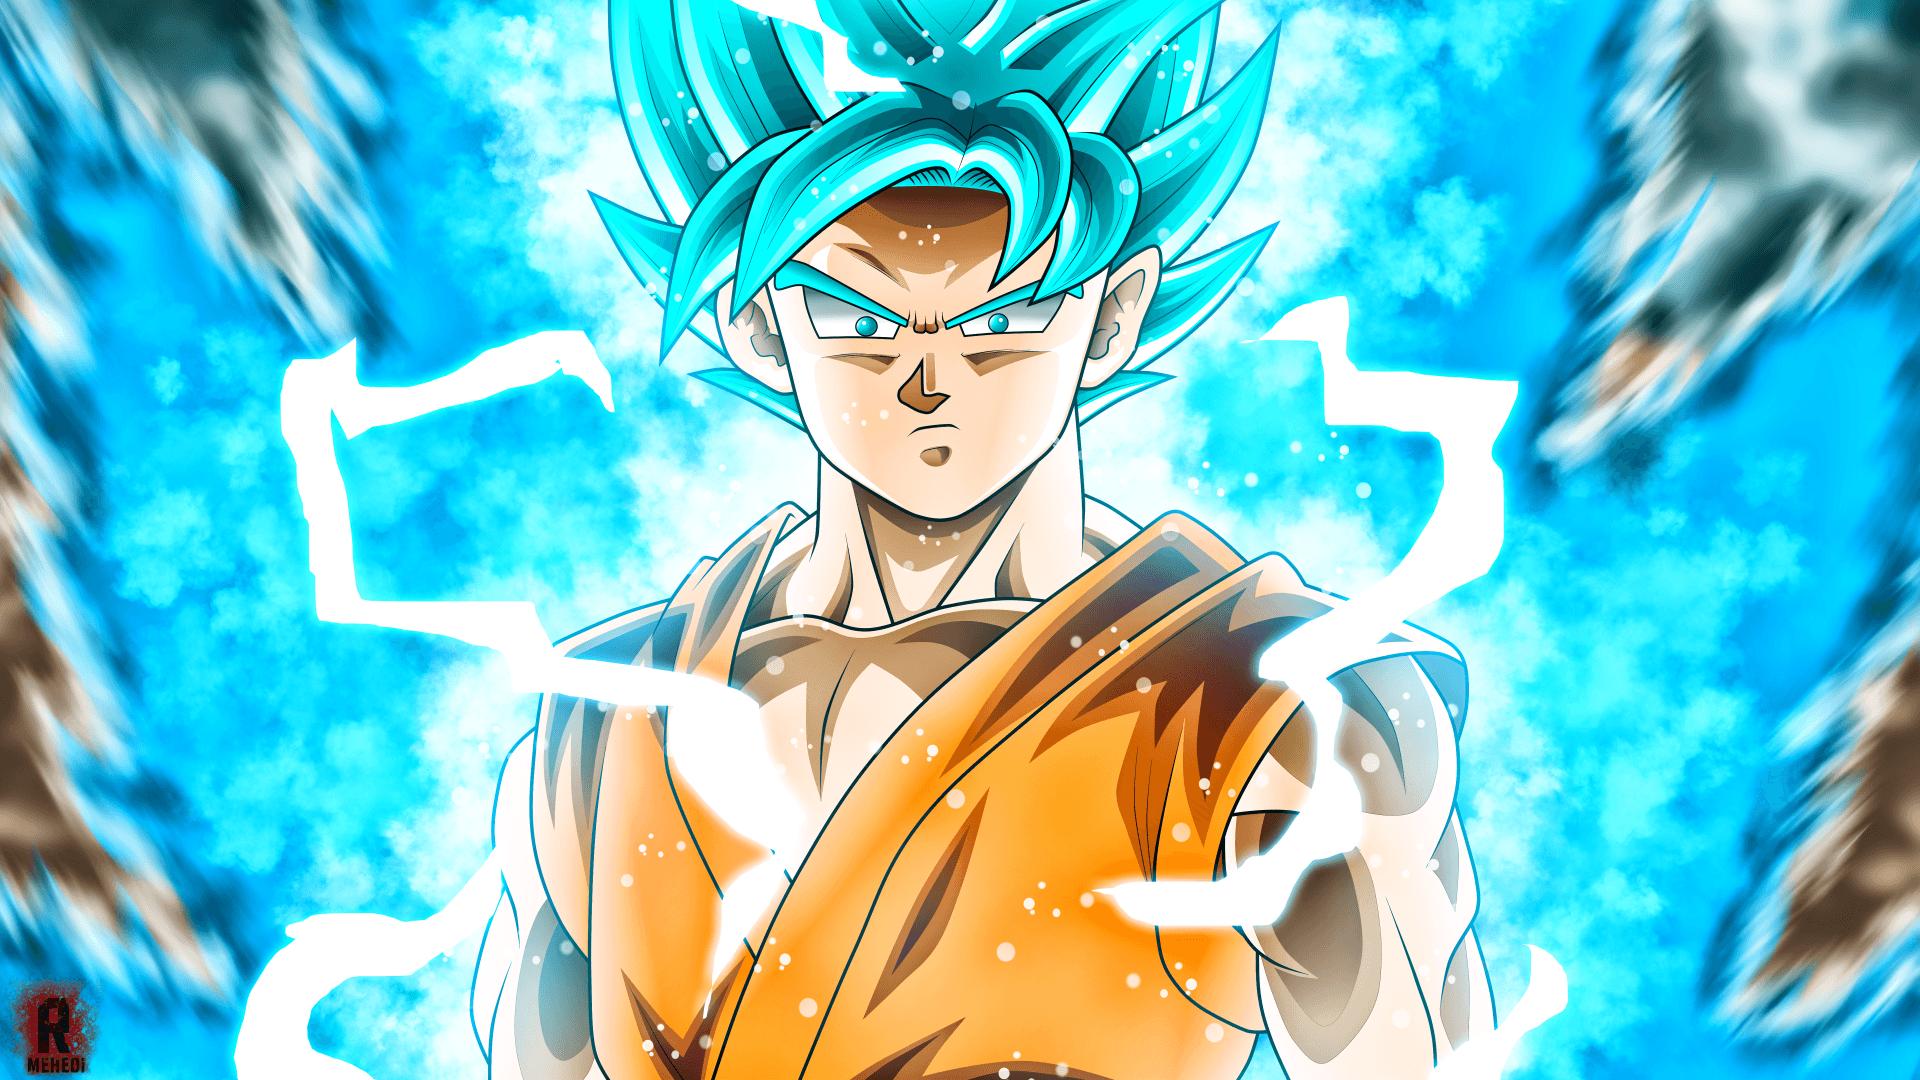 Goku Super Saiyan Blue Wallpapers Top Free Goku Super Saiyan